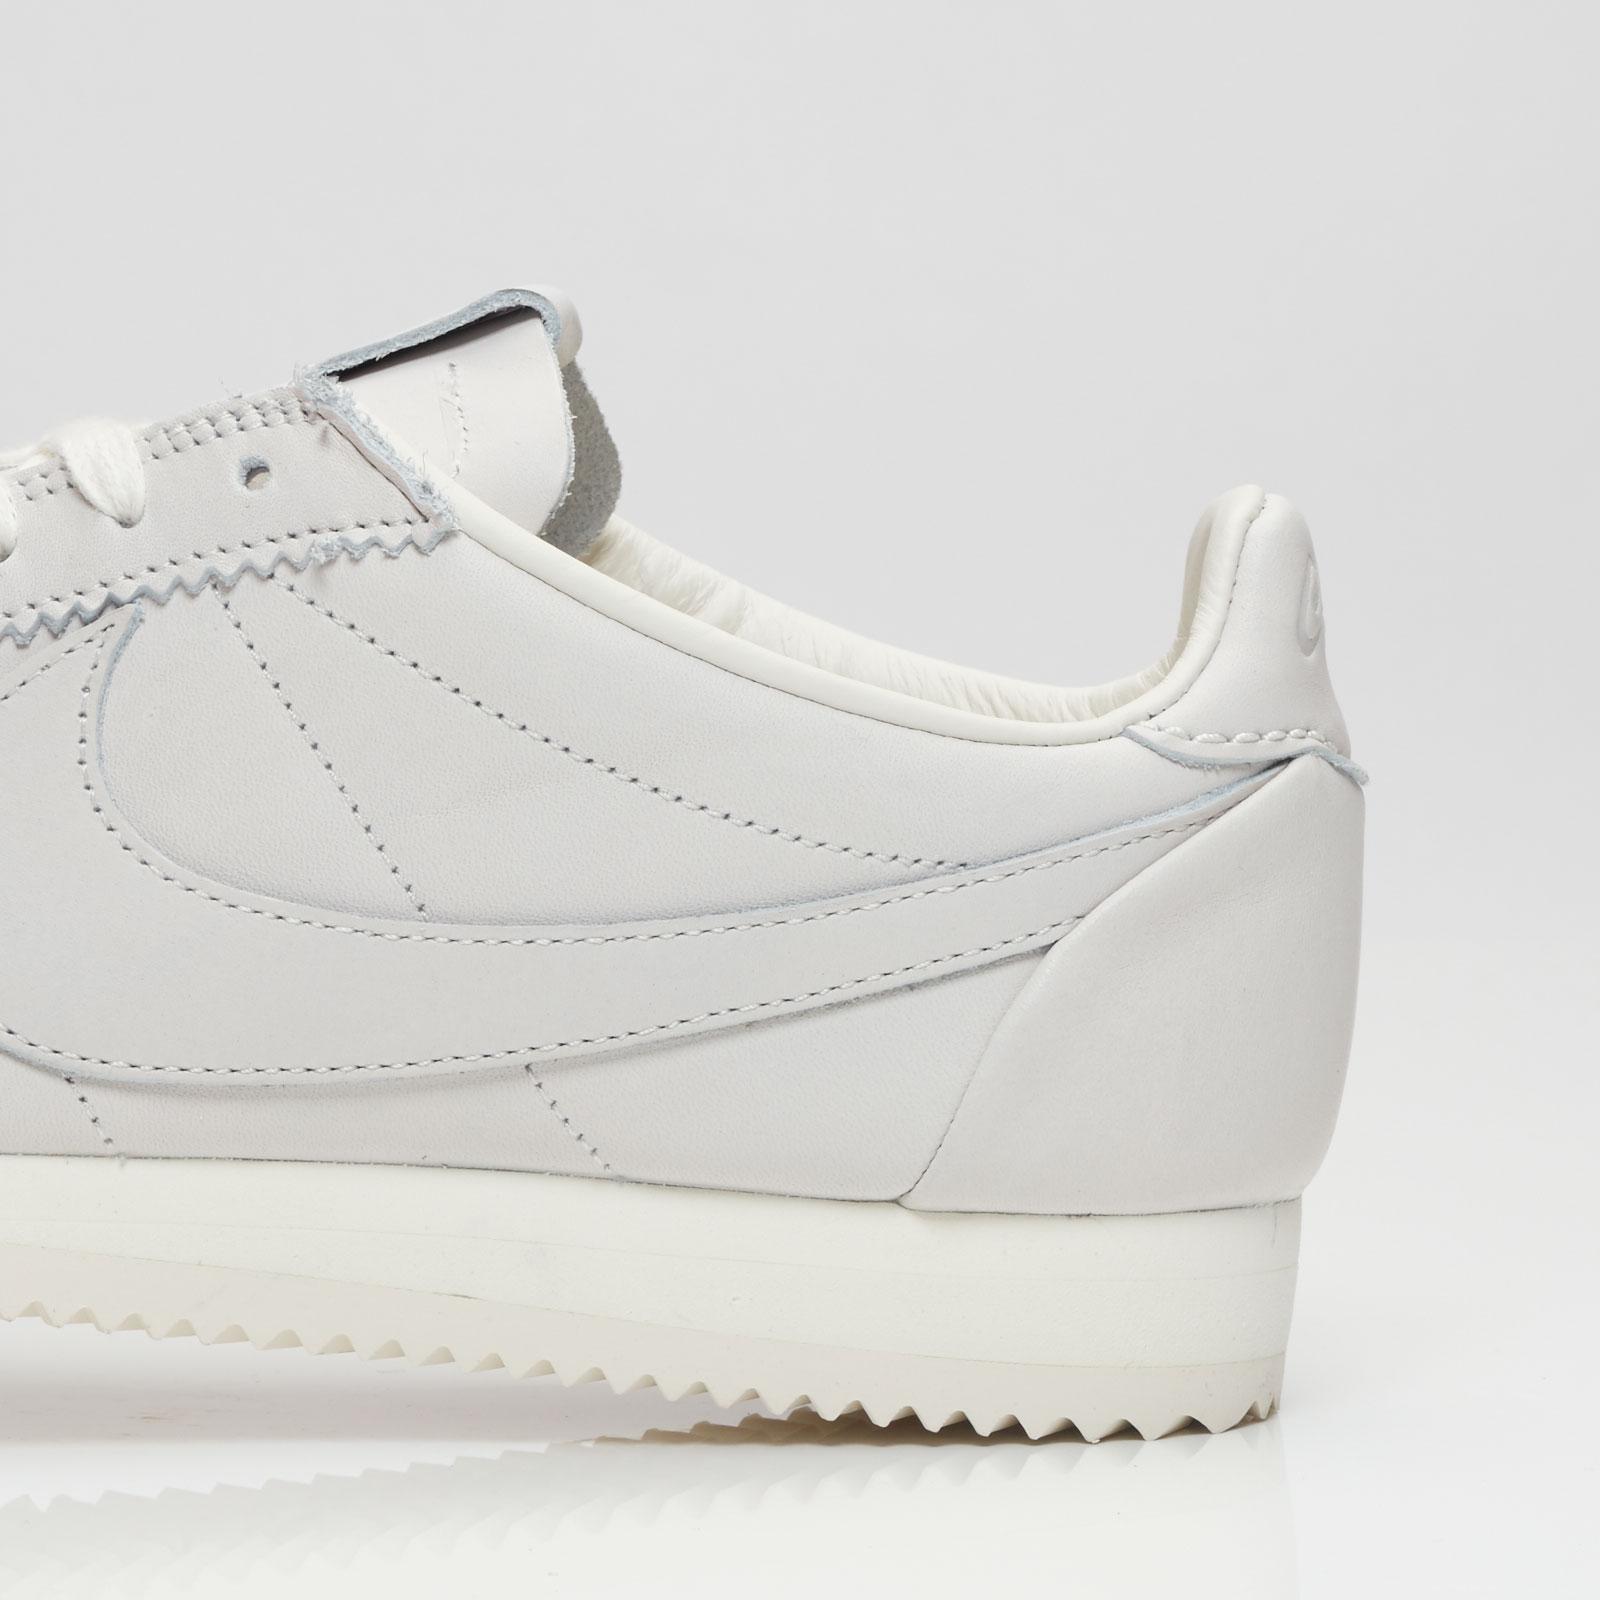 new concept 67f44 8b9d6 Nike Classic Cortez Premium Qs Tz - 898088-100 - Sneakersnstuff   sneakers    streetwear online since 1999